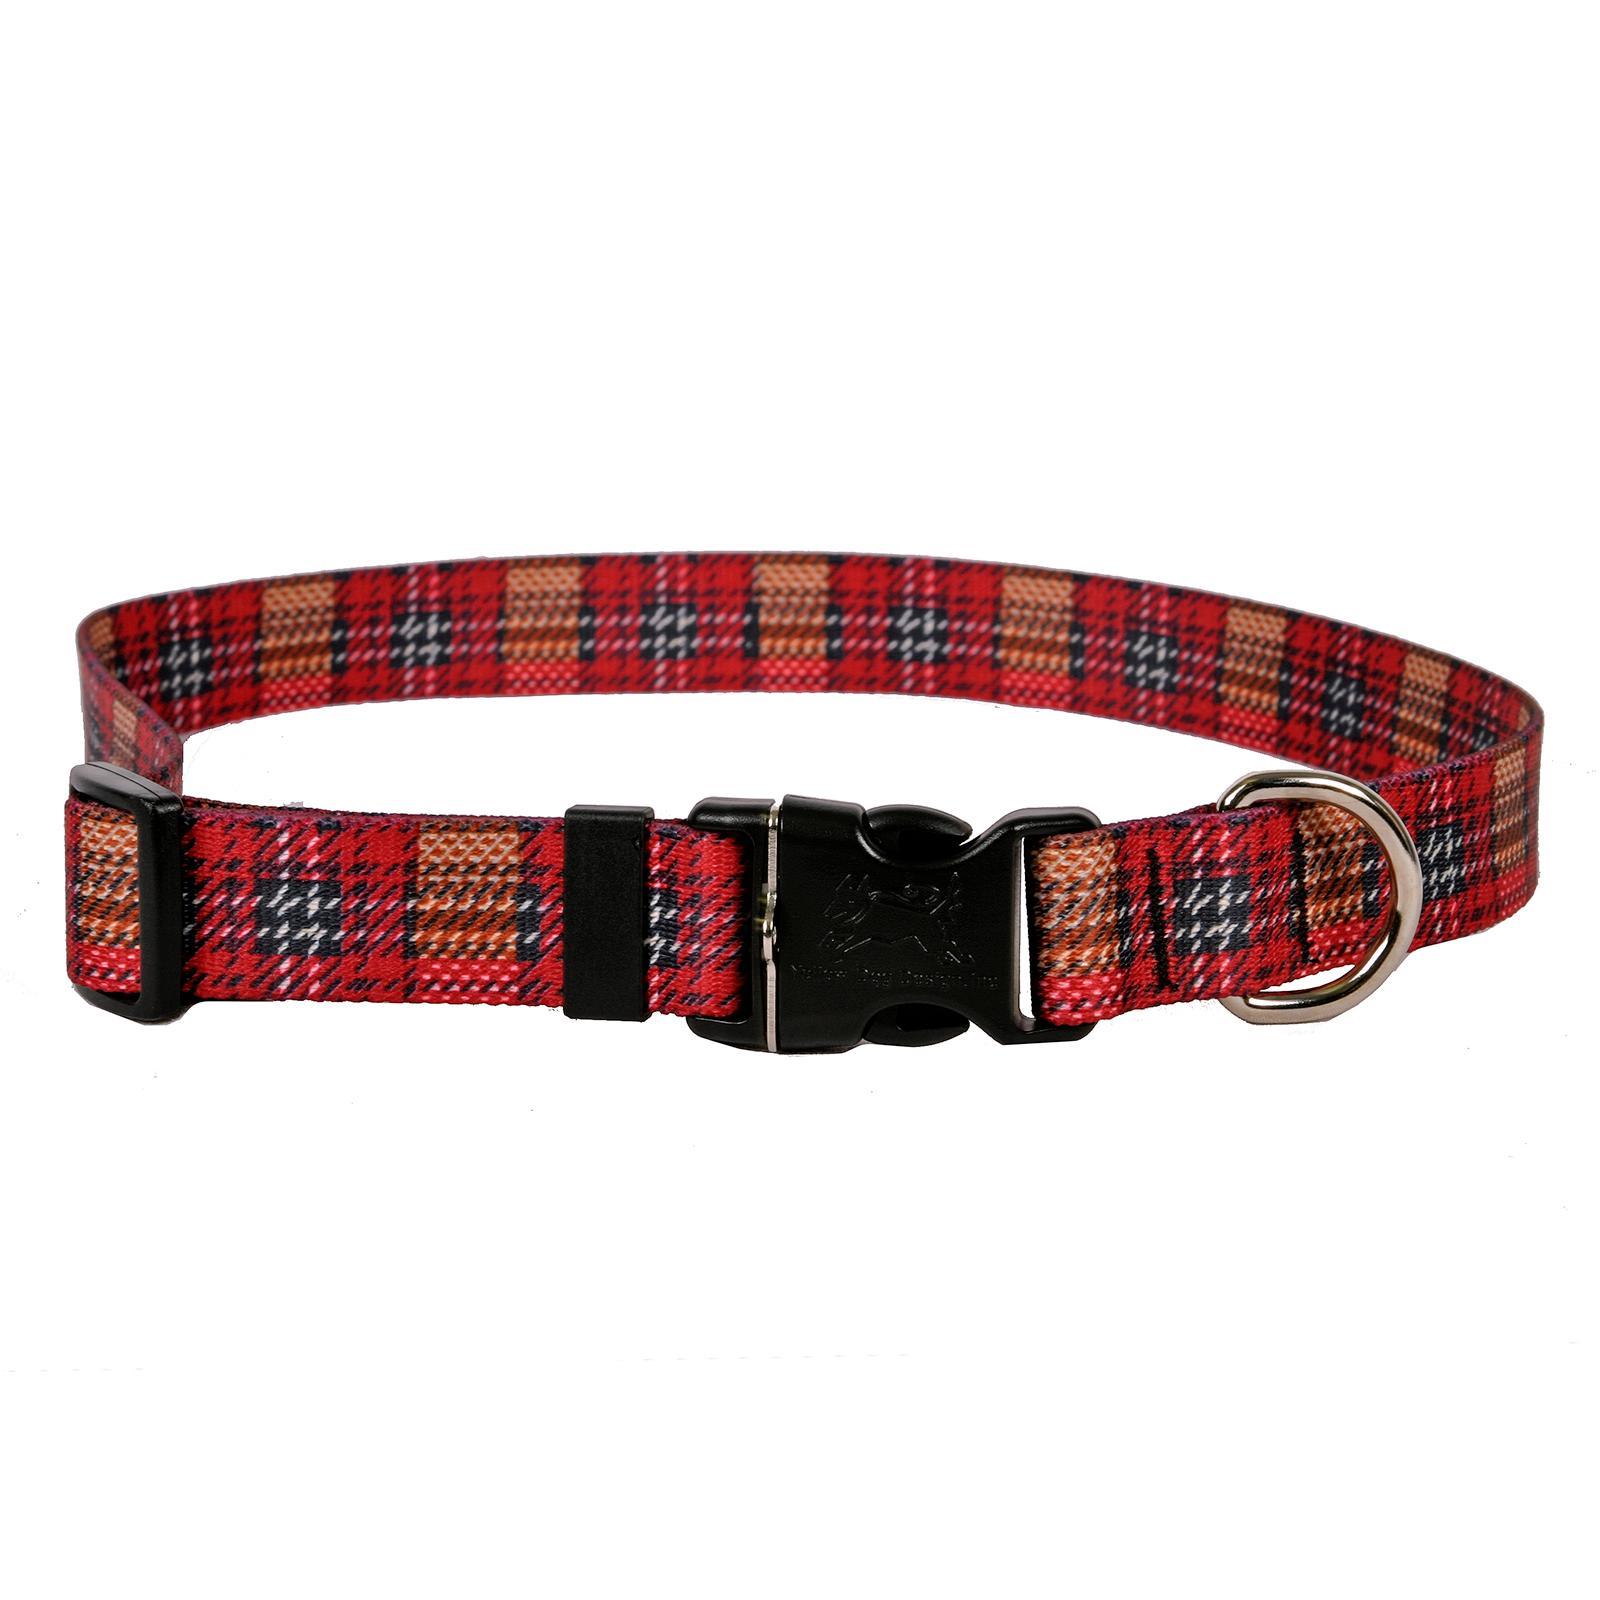 Highland Plaid Dog Collar by Yellow Dog - Red